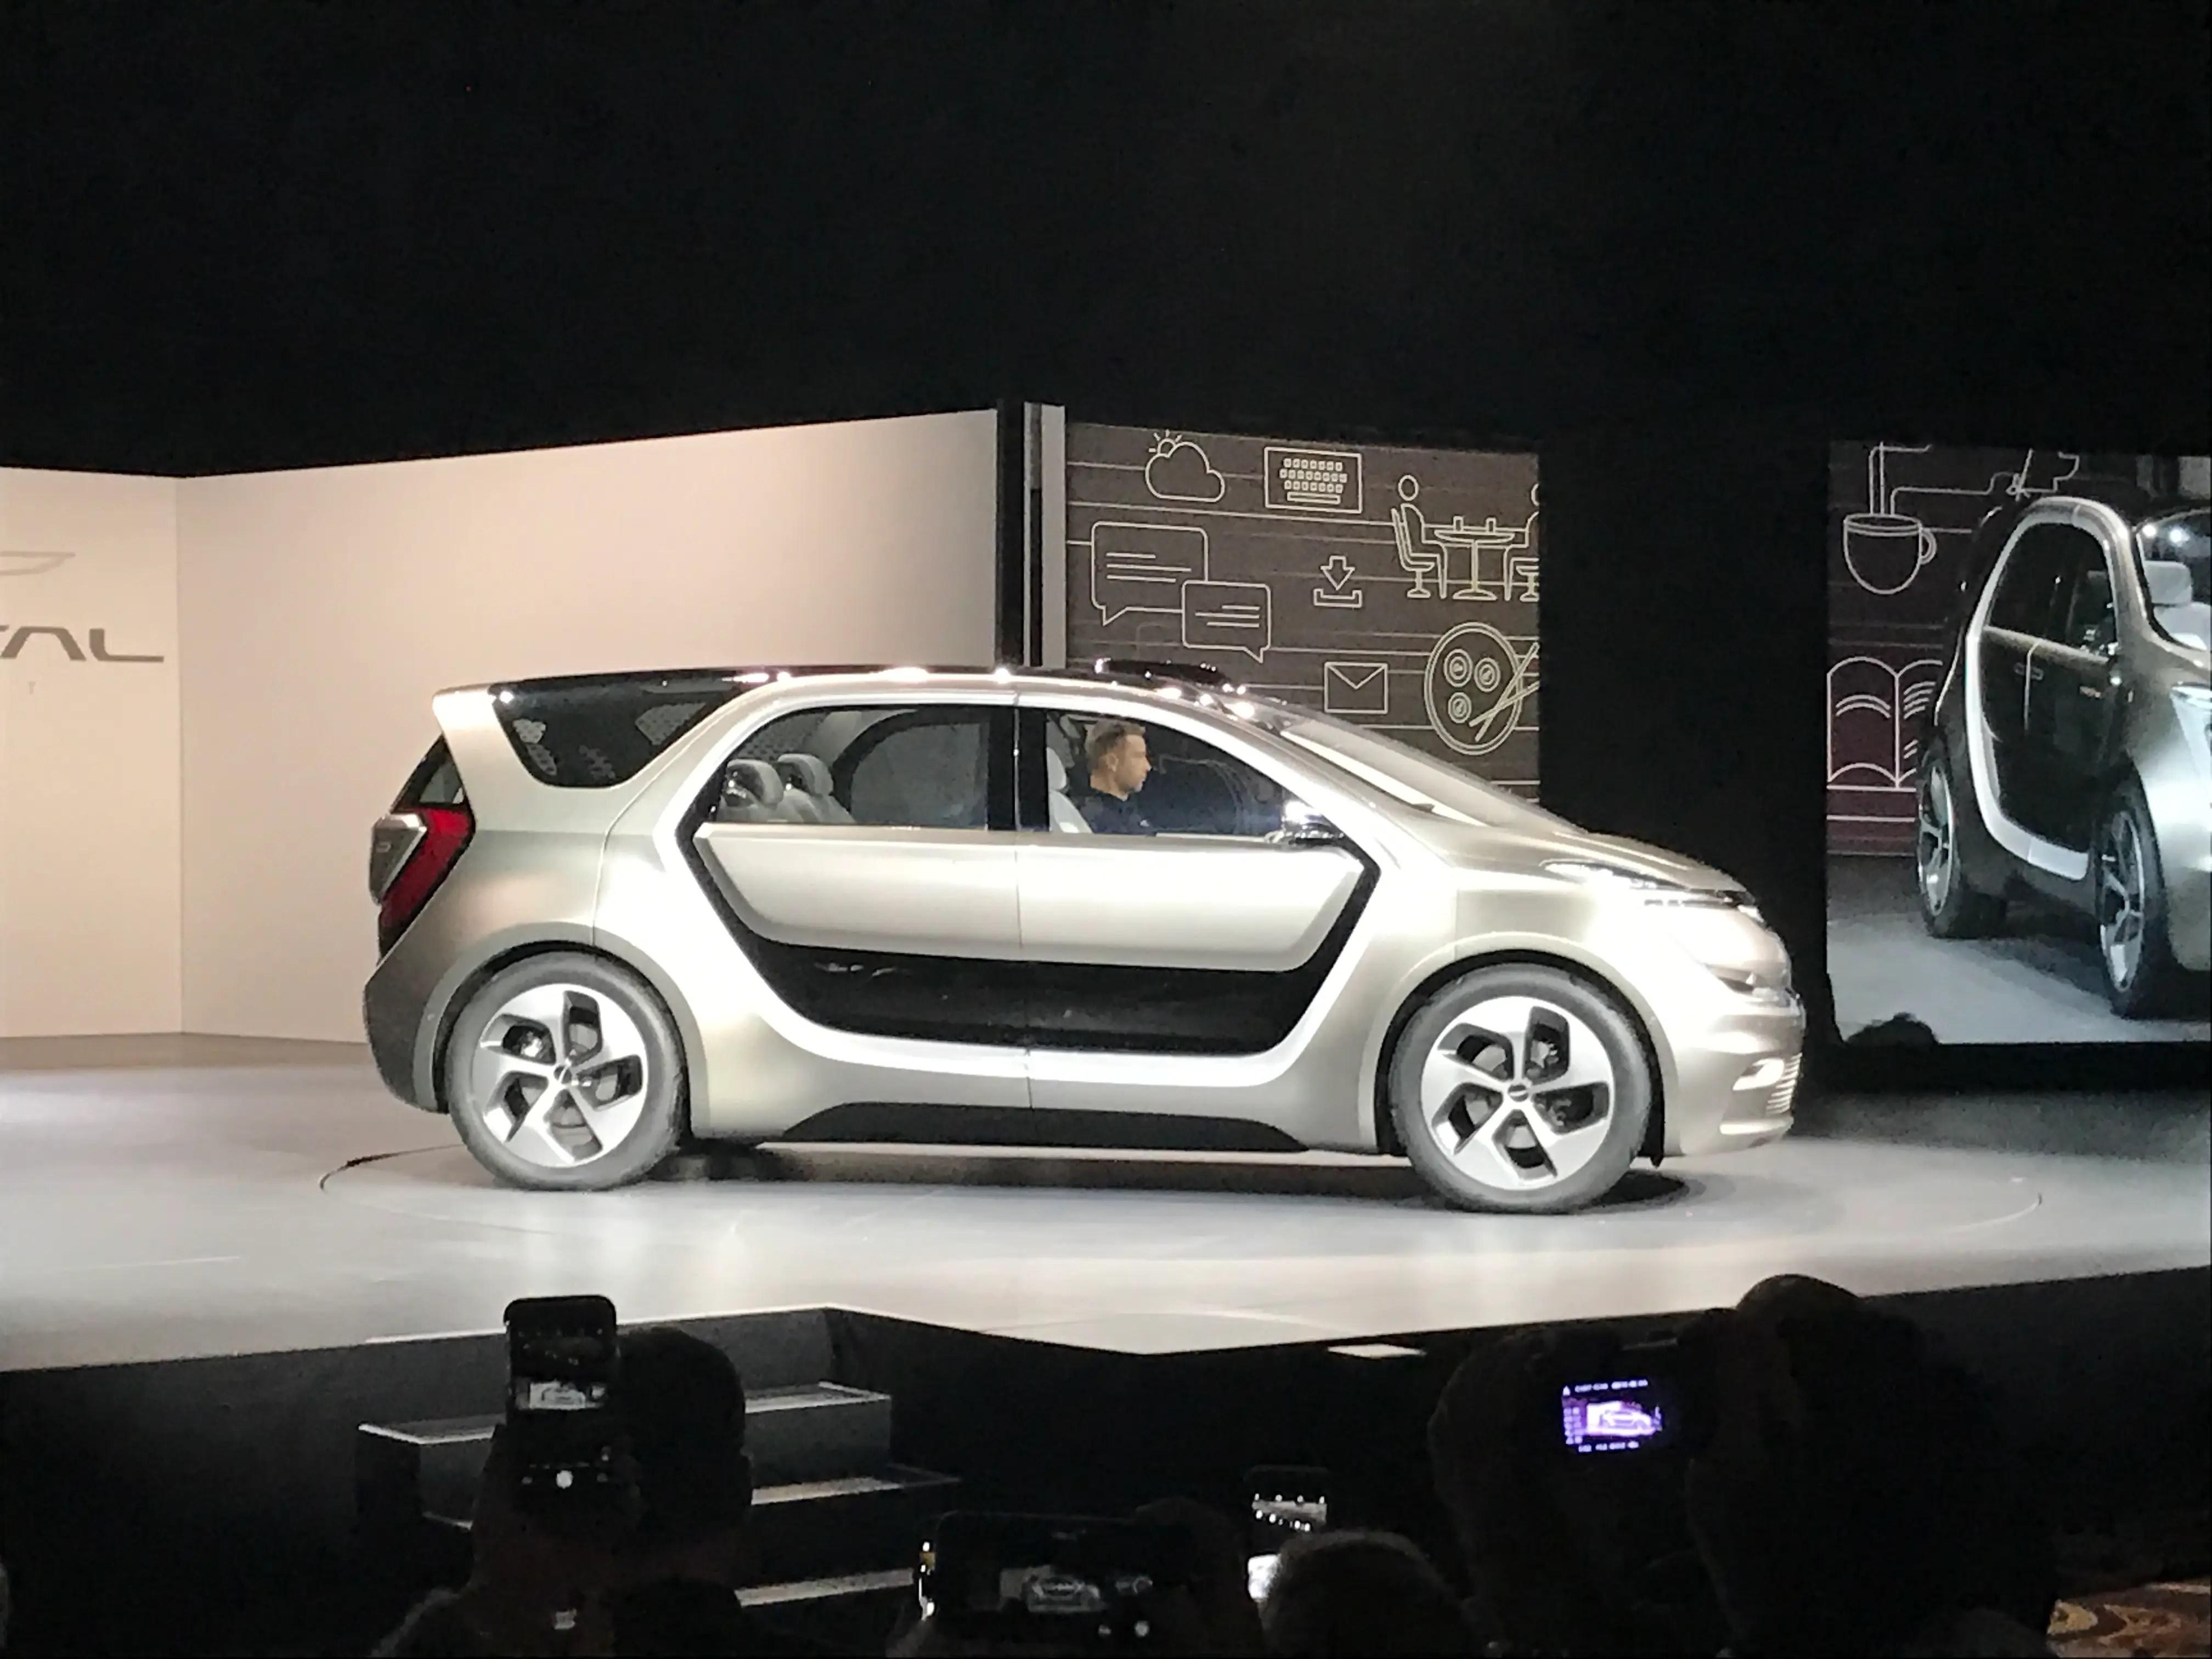 Fca Just Unveiled An All Electric High Tech Minivan